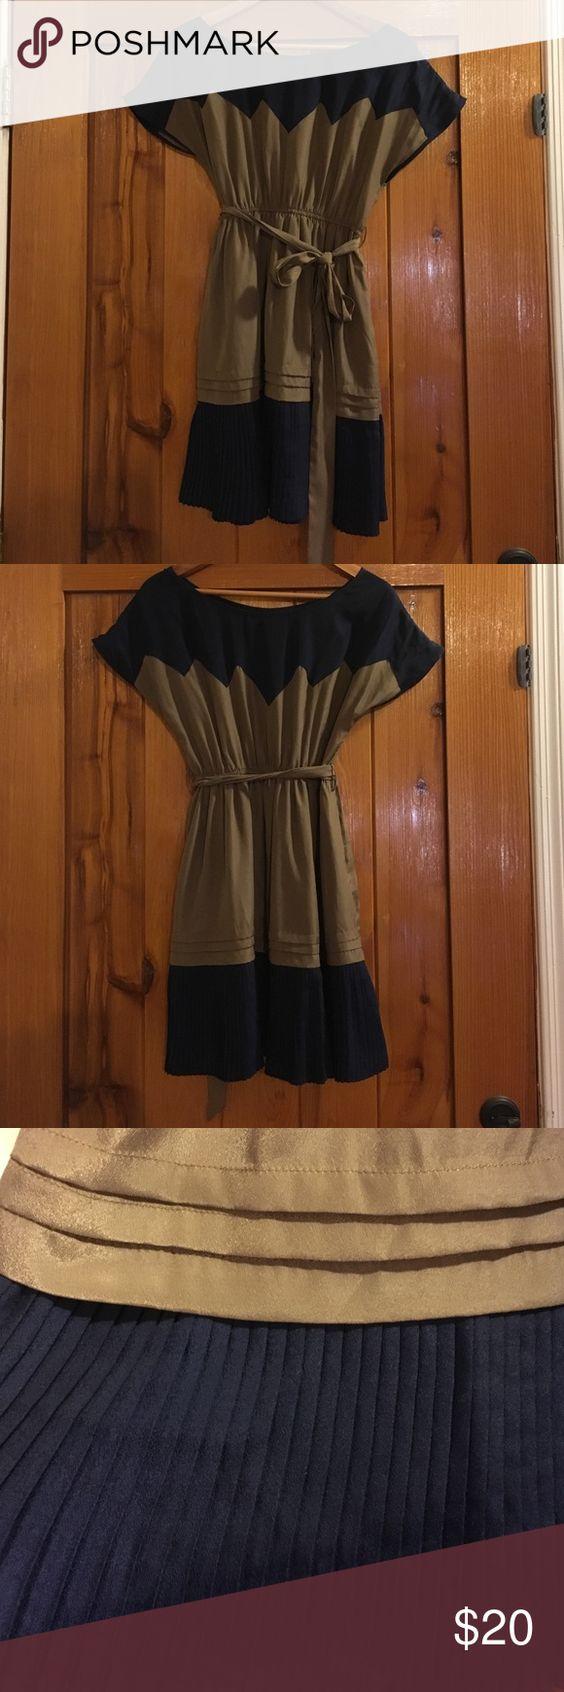 Double Zero Pleated Dress Pleated dress with belt! Great condition! Double Zero Dresses Mini